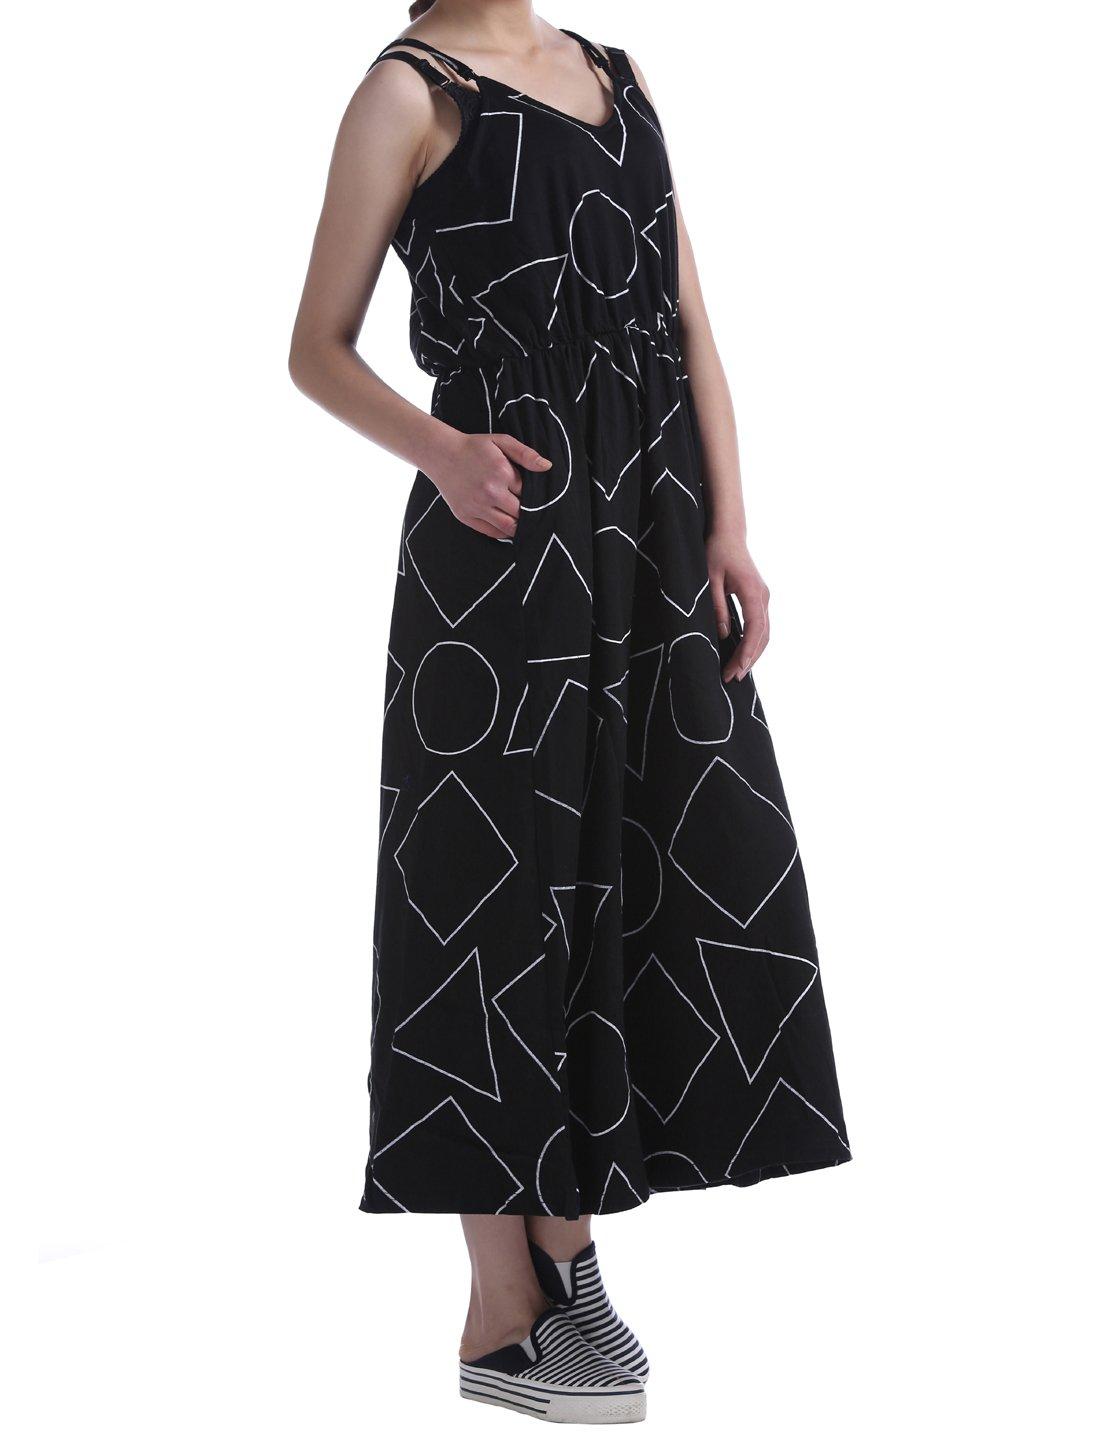 Huan Xun Women's Cotton Geometric Print High Waist Strap Dress Maxi Length, AOLO-647 (Black)